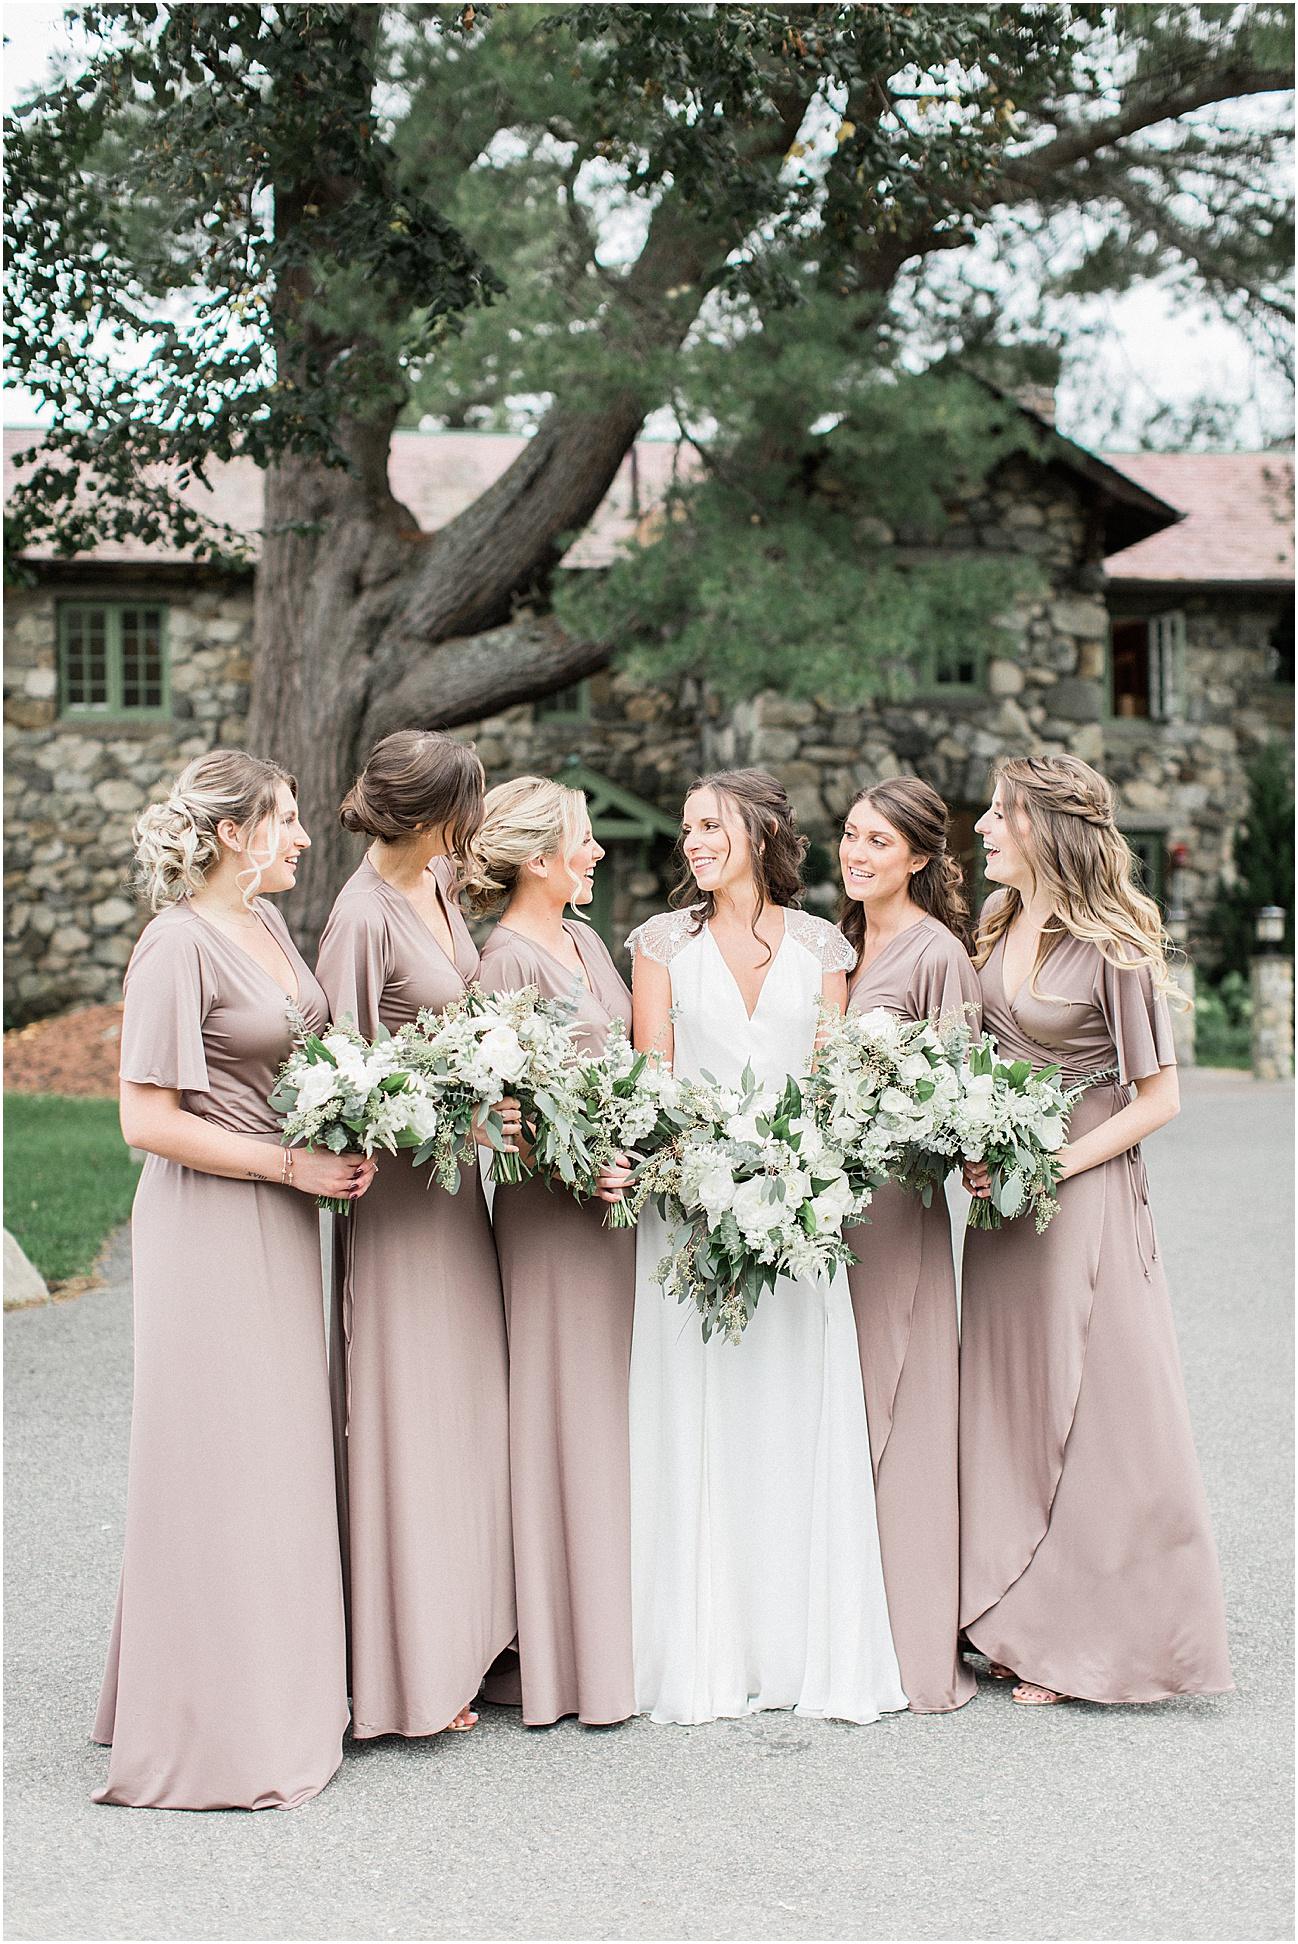 jenna_mike_willowdale_estate_topsfield_neutral_whites_greens_fall_cape_cod_boston_wedding_photographer_meredith_jane_photography_photo_1444.jpg